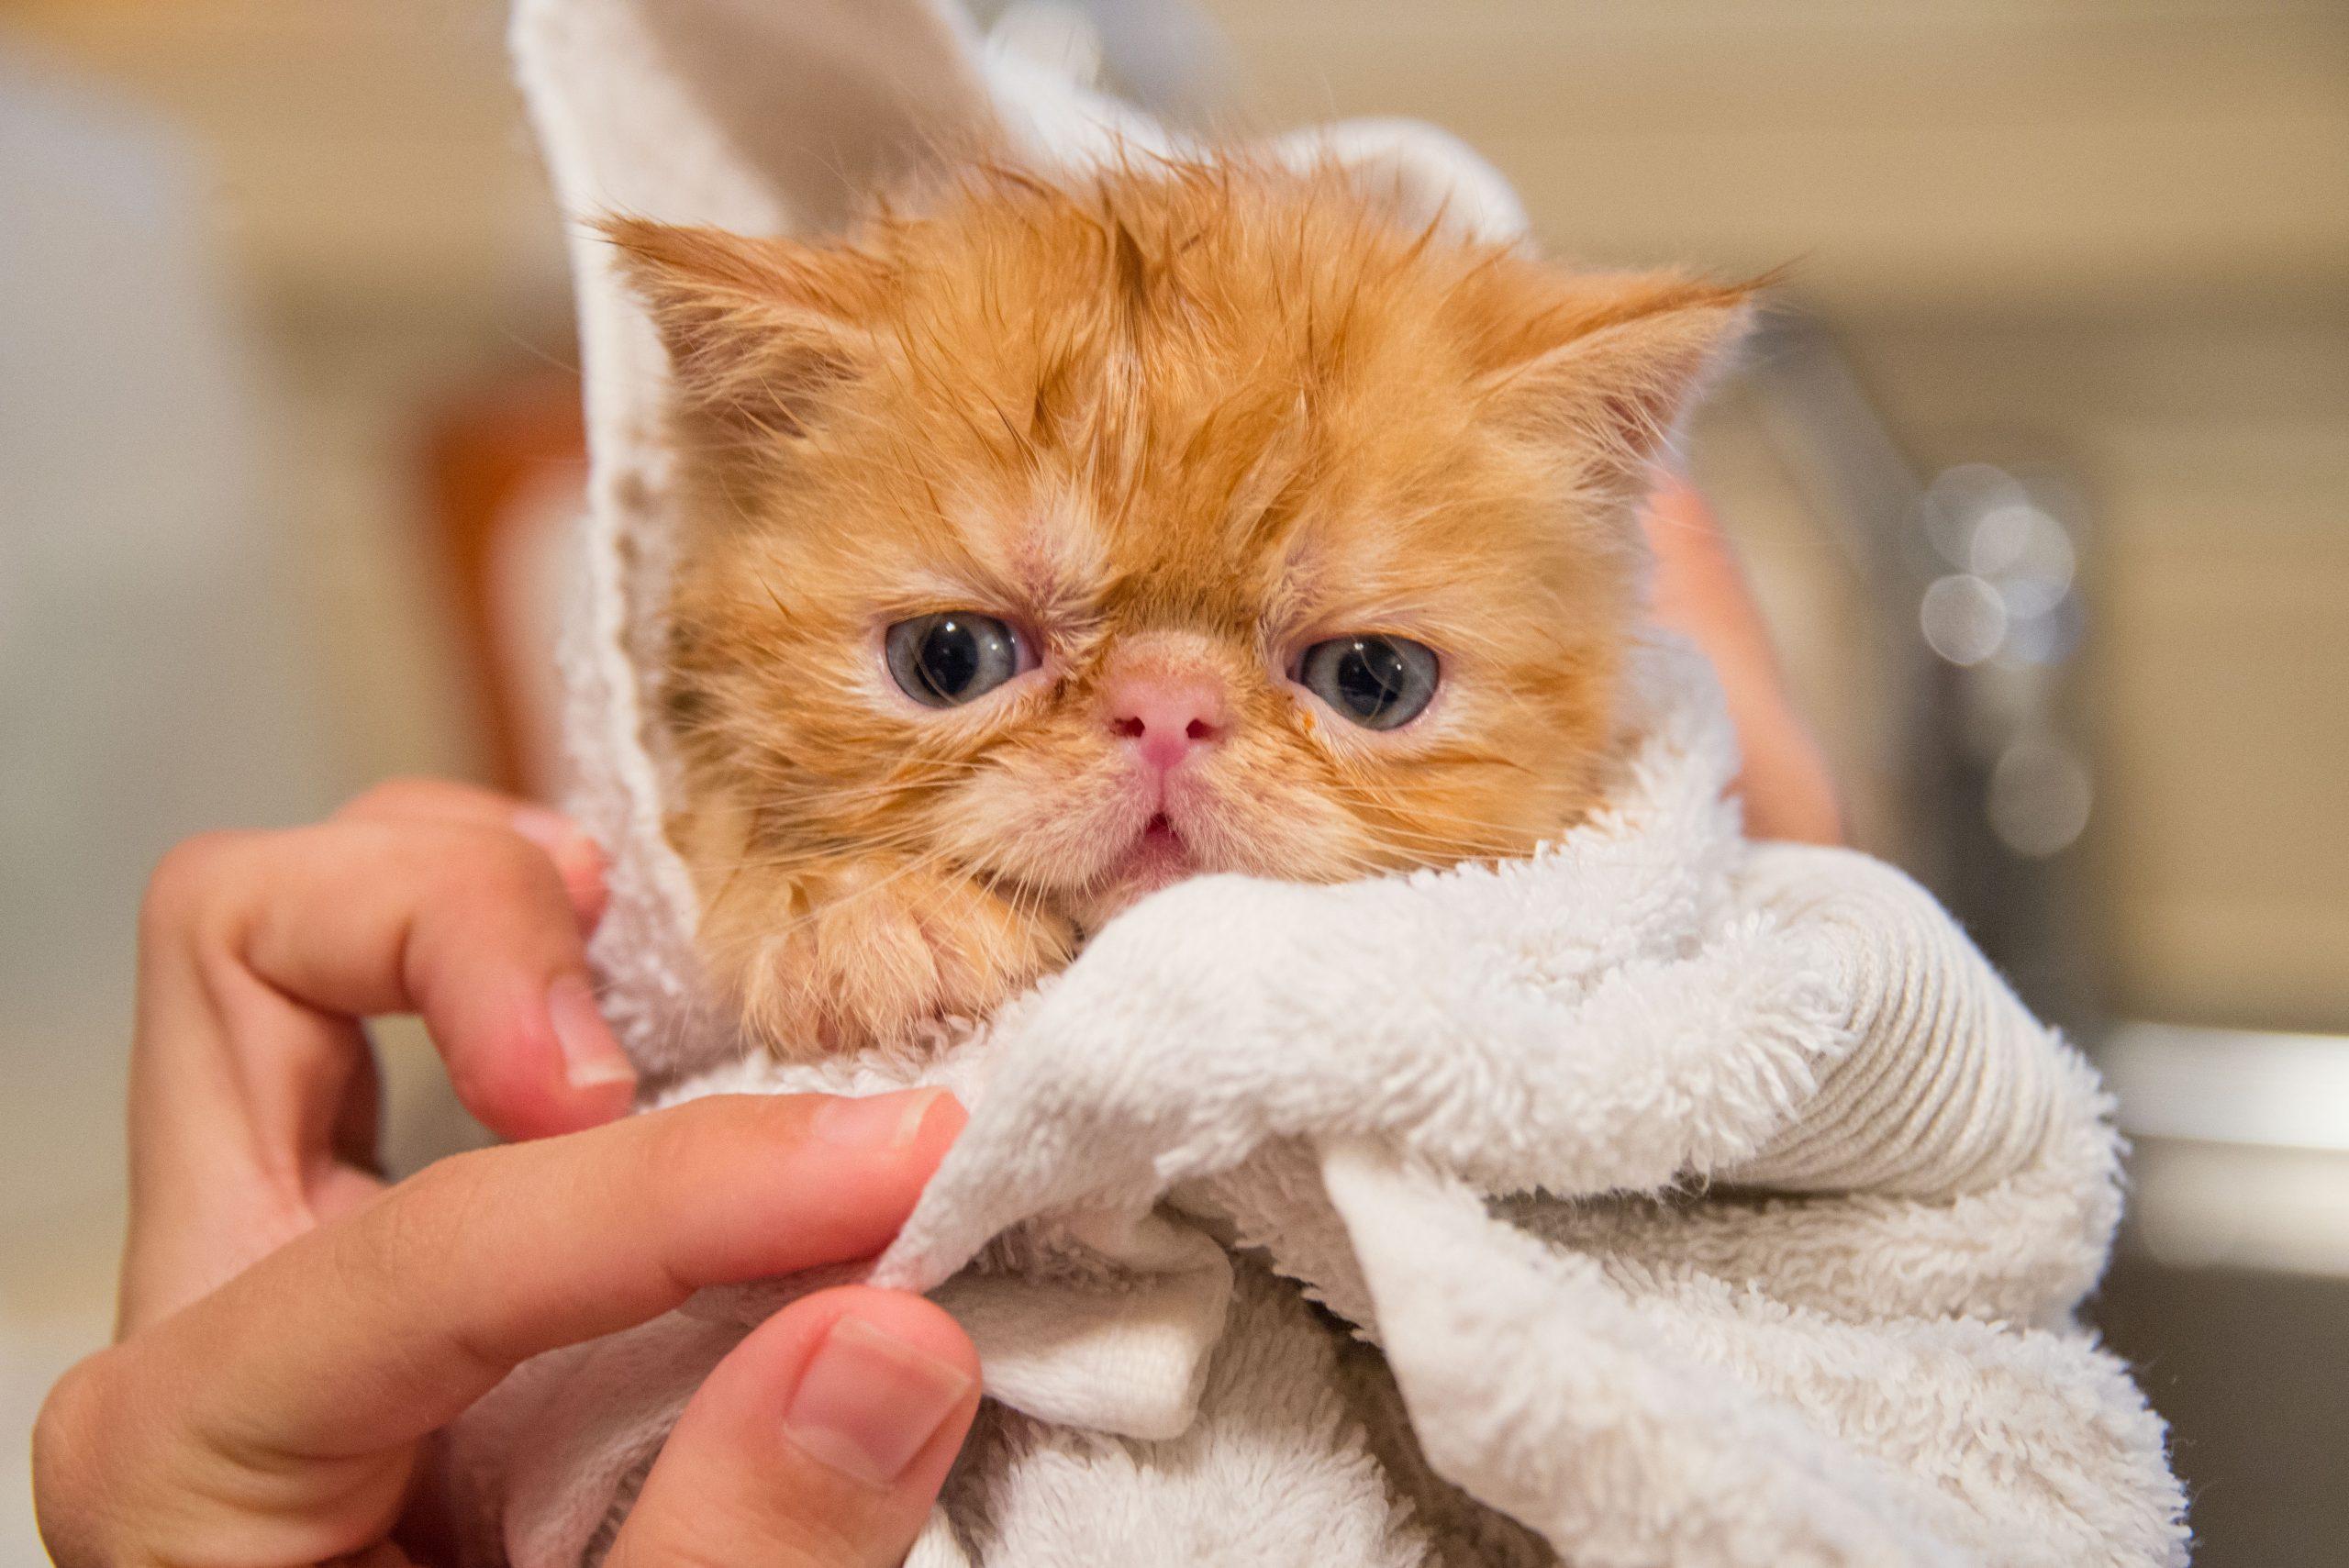 dry a cat after a bath